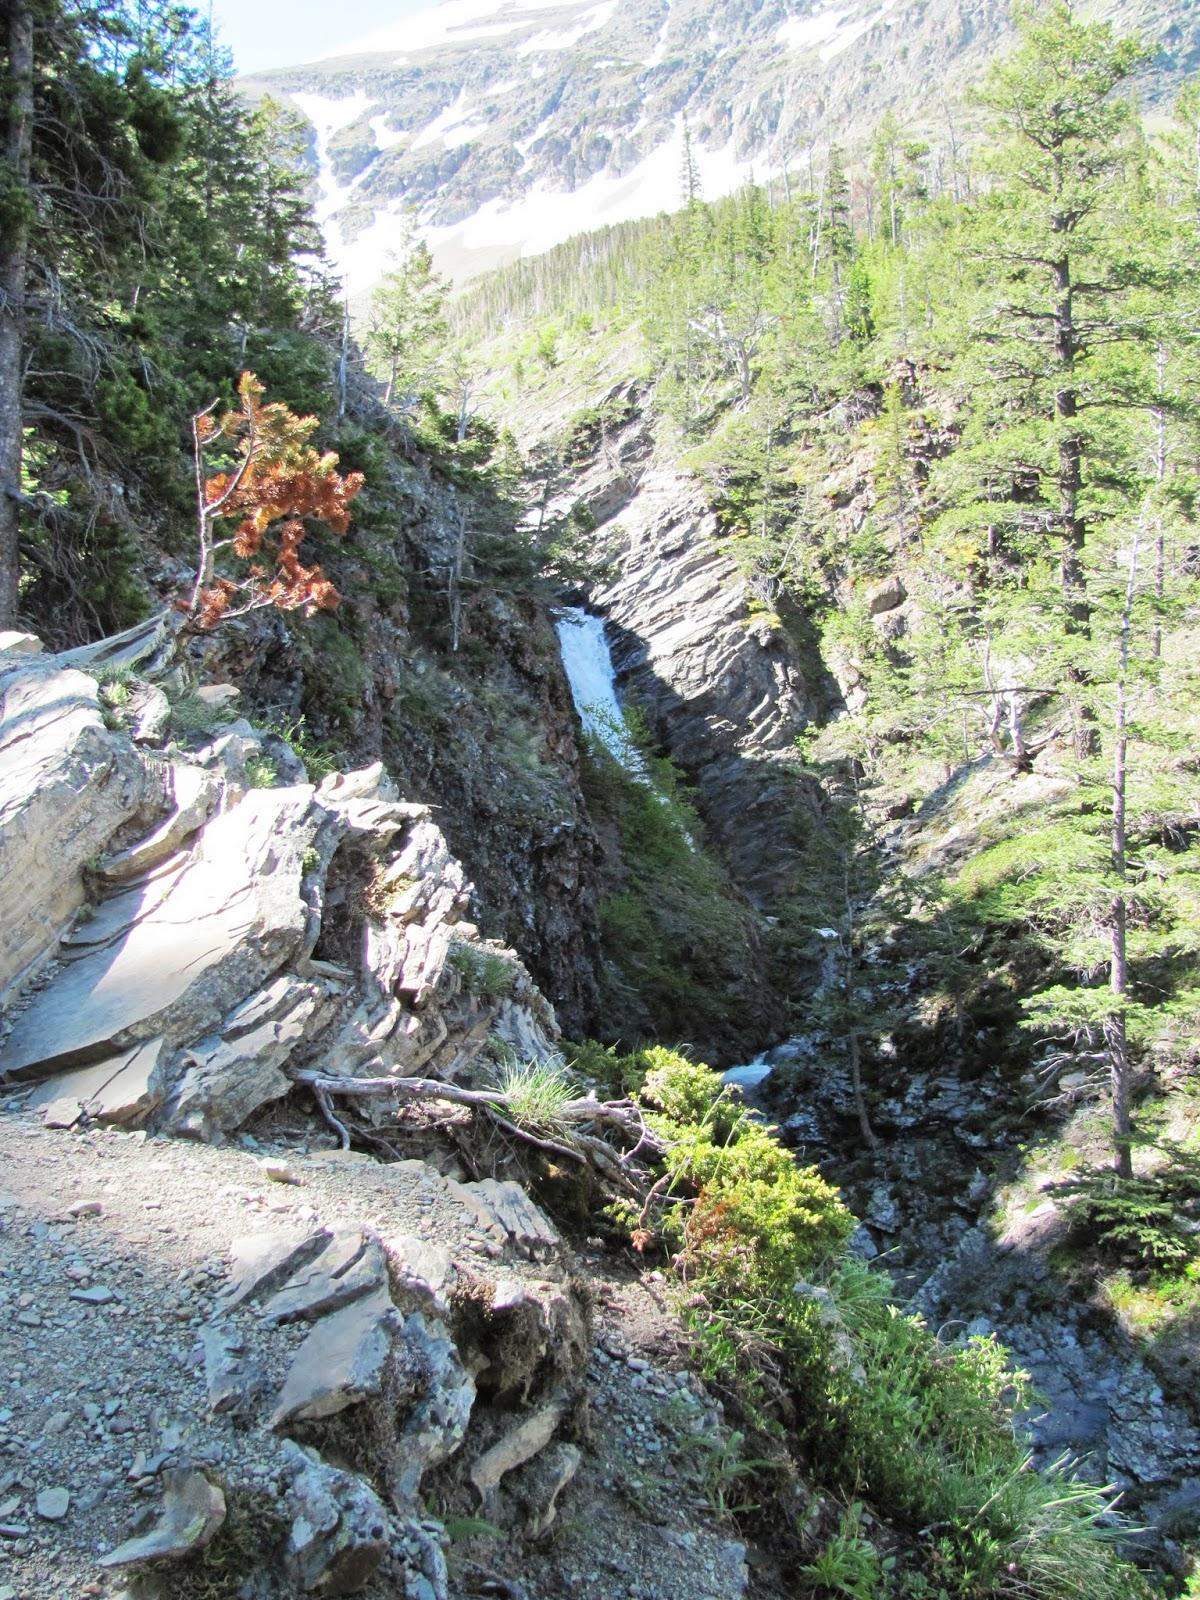 Appistoki Falls at Two Medicine at Glacier National Park in Montana